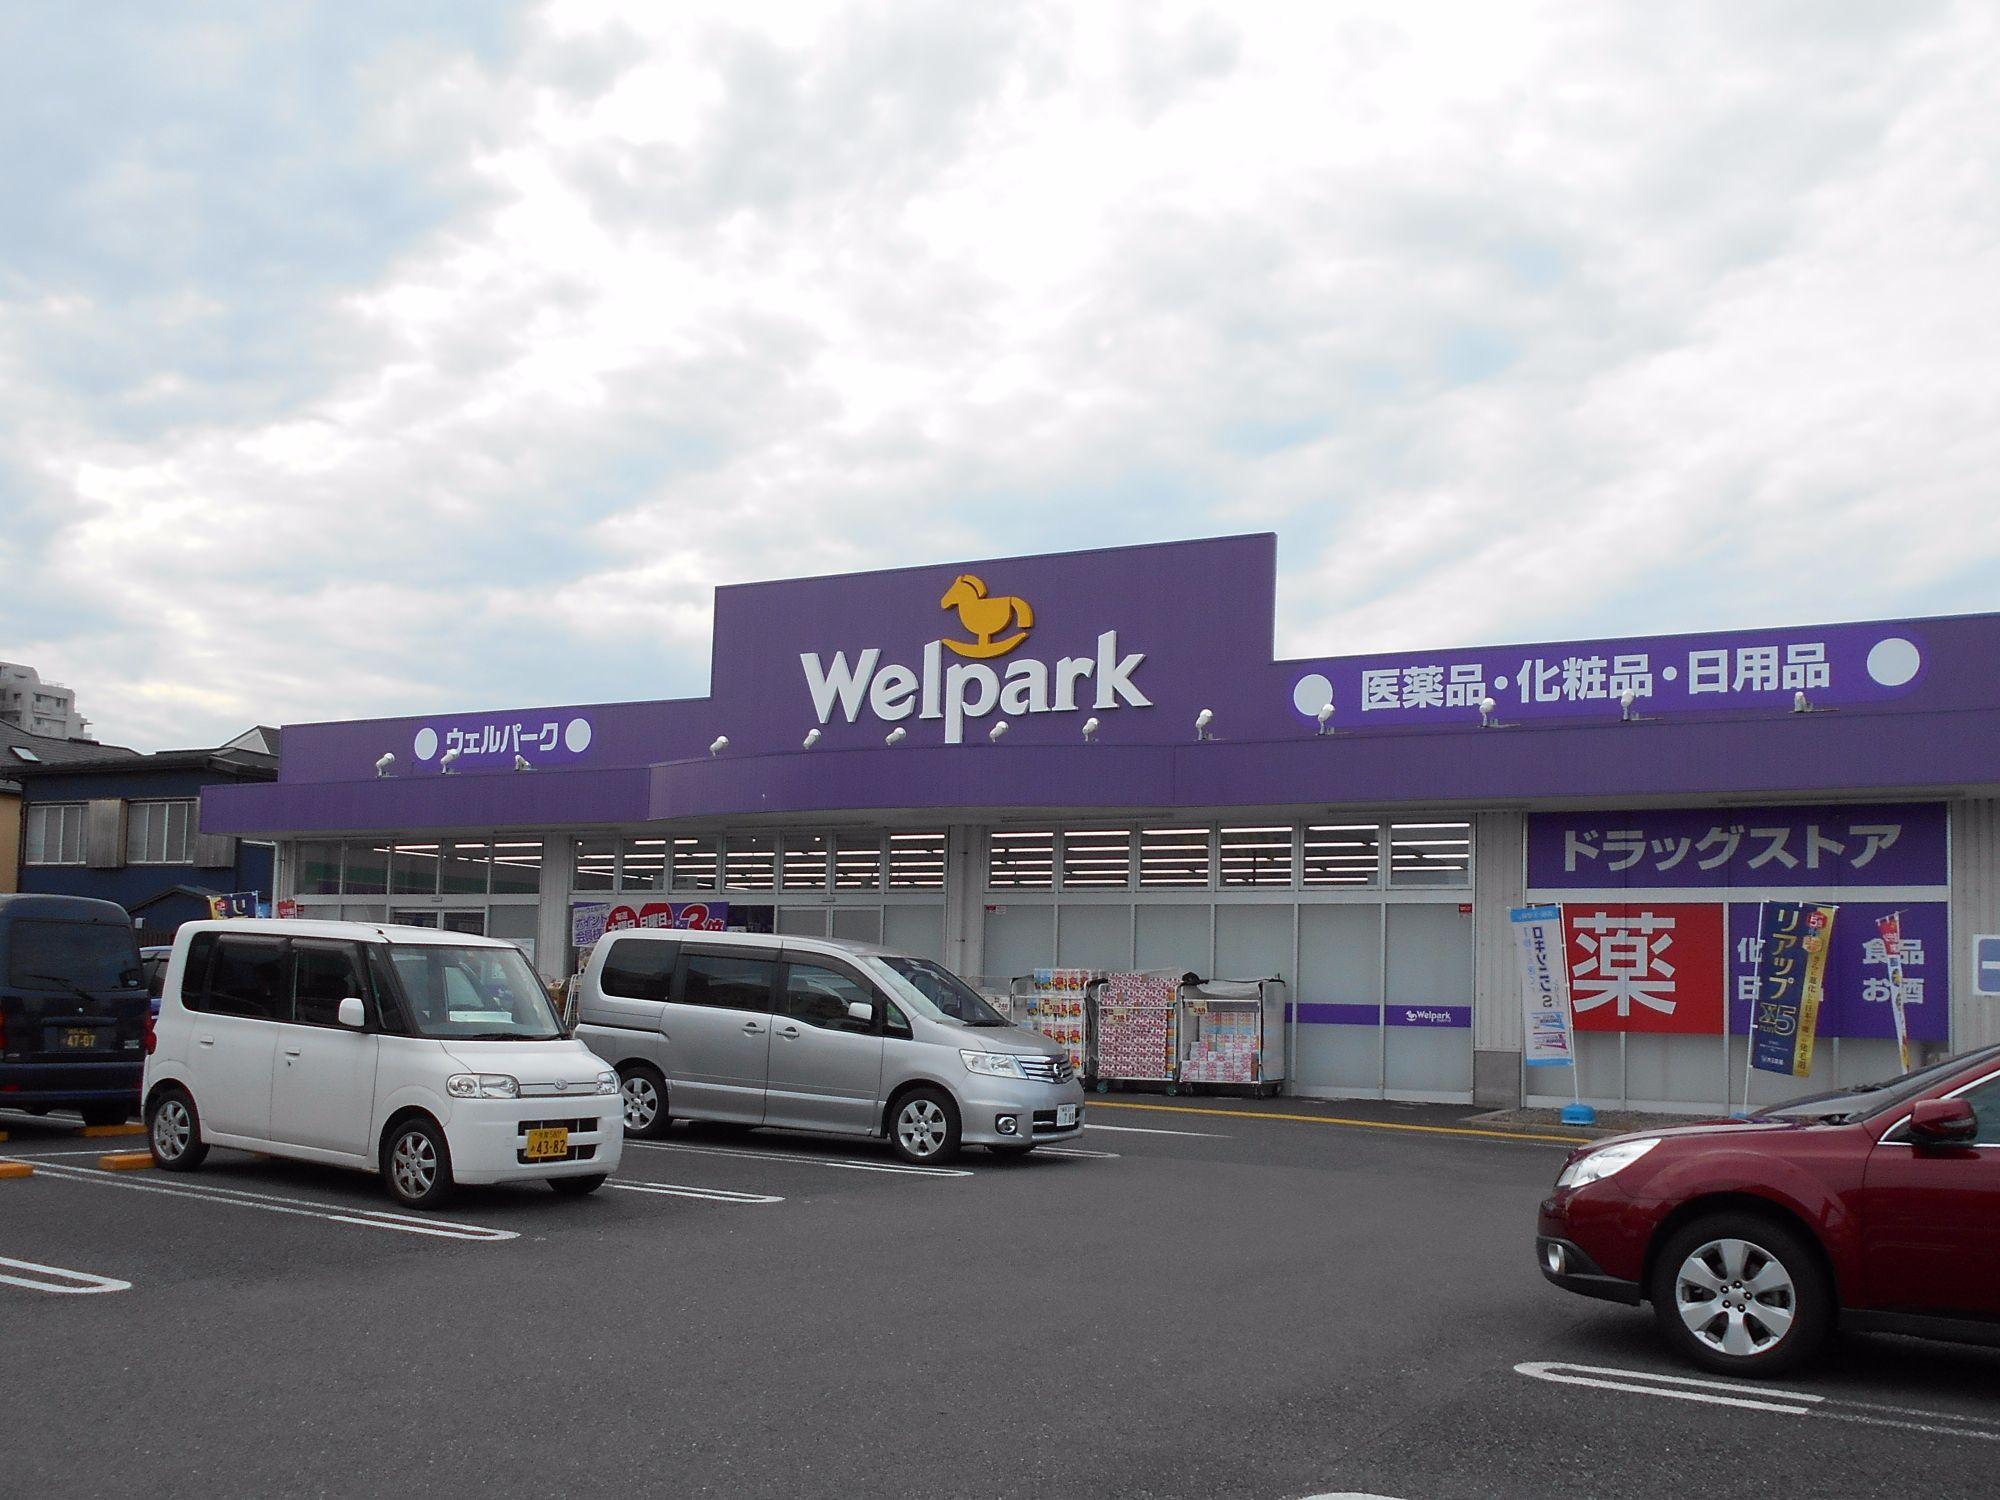 周辺施設:Welpark